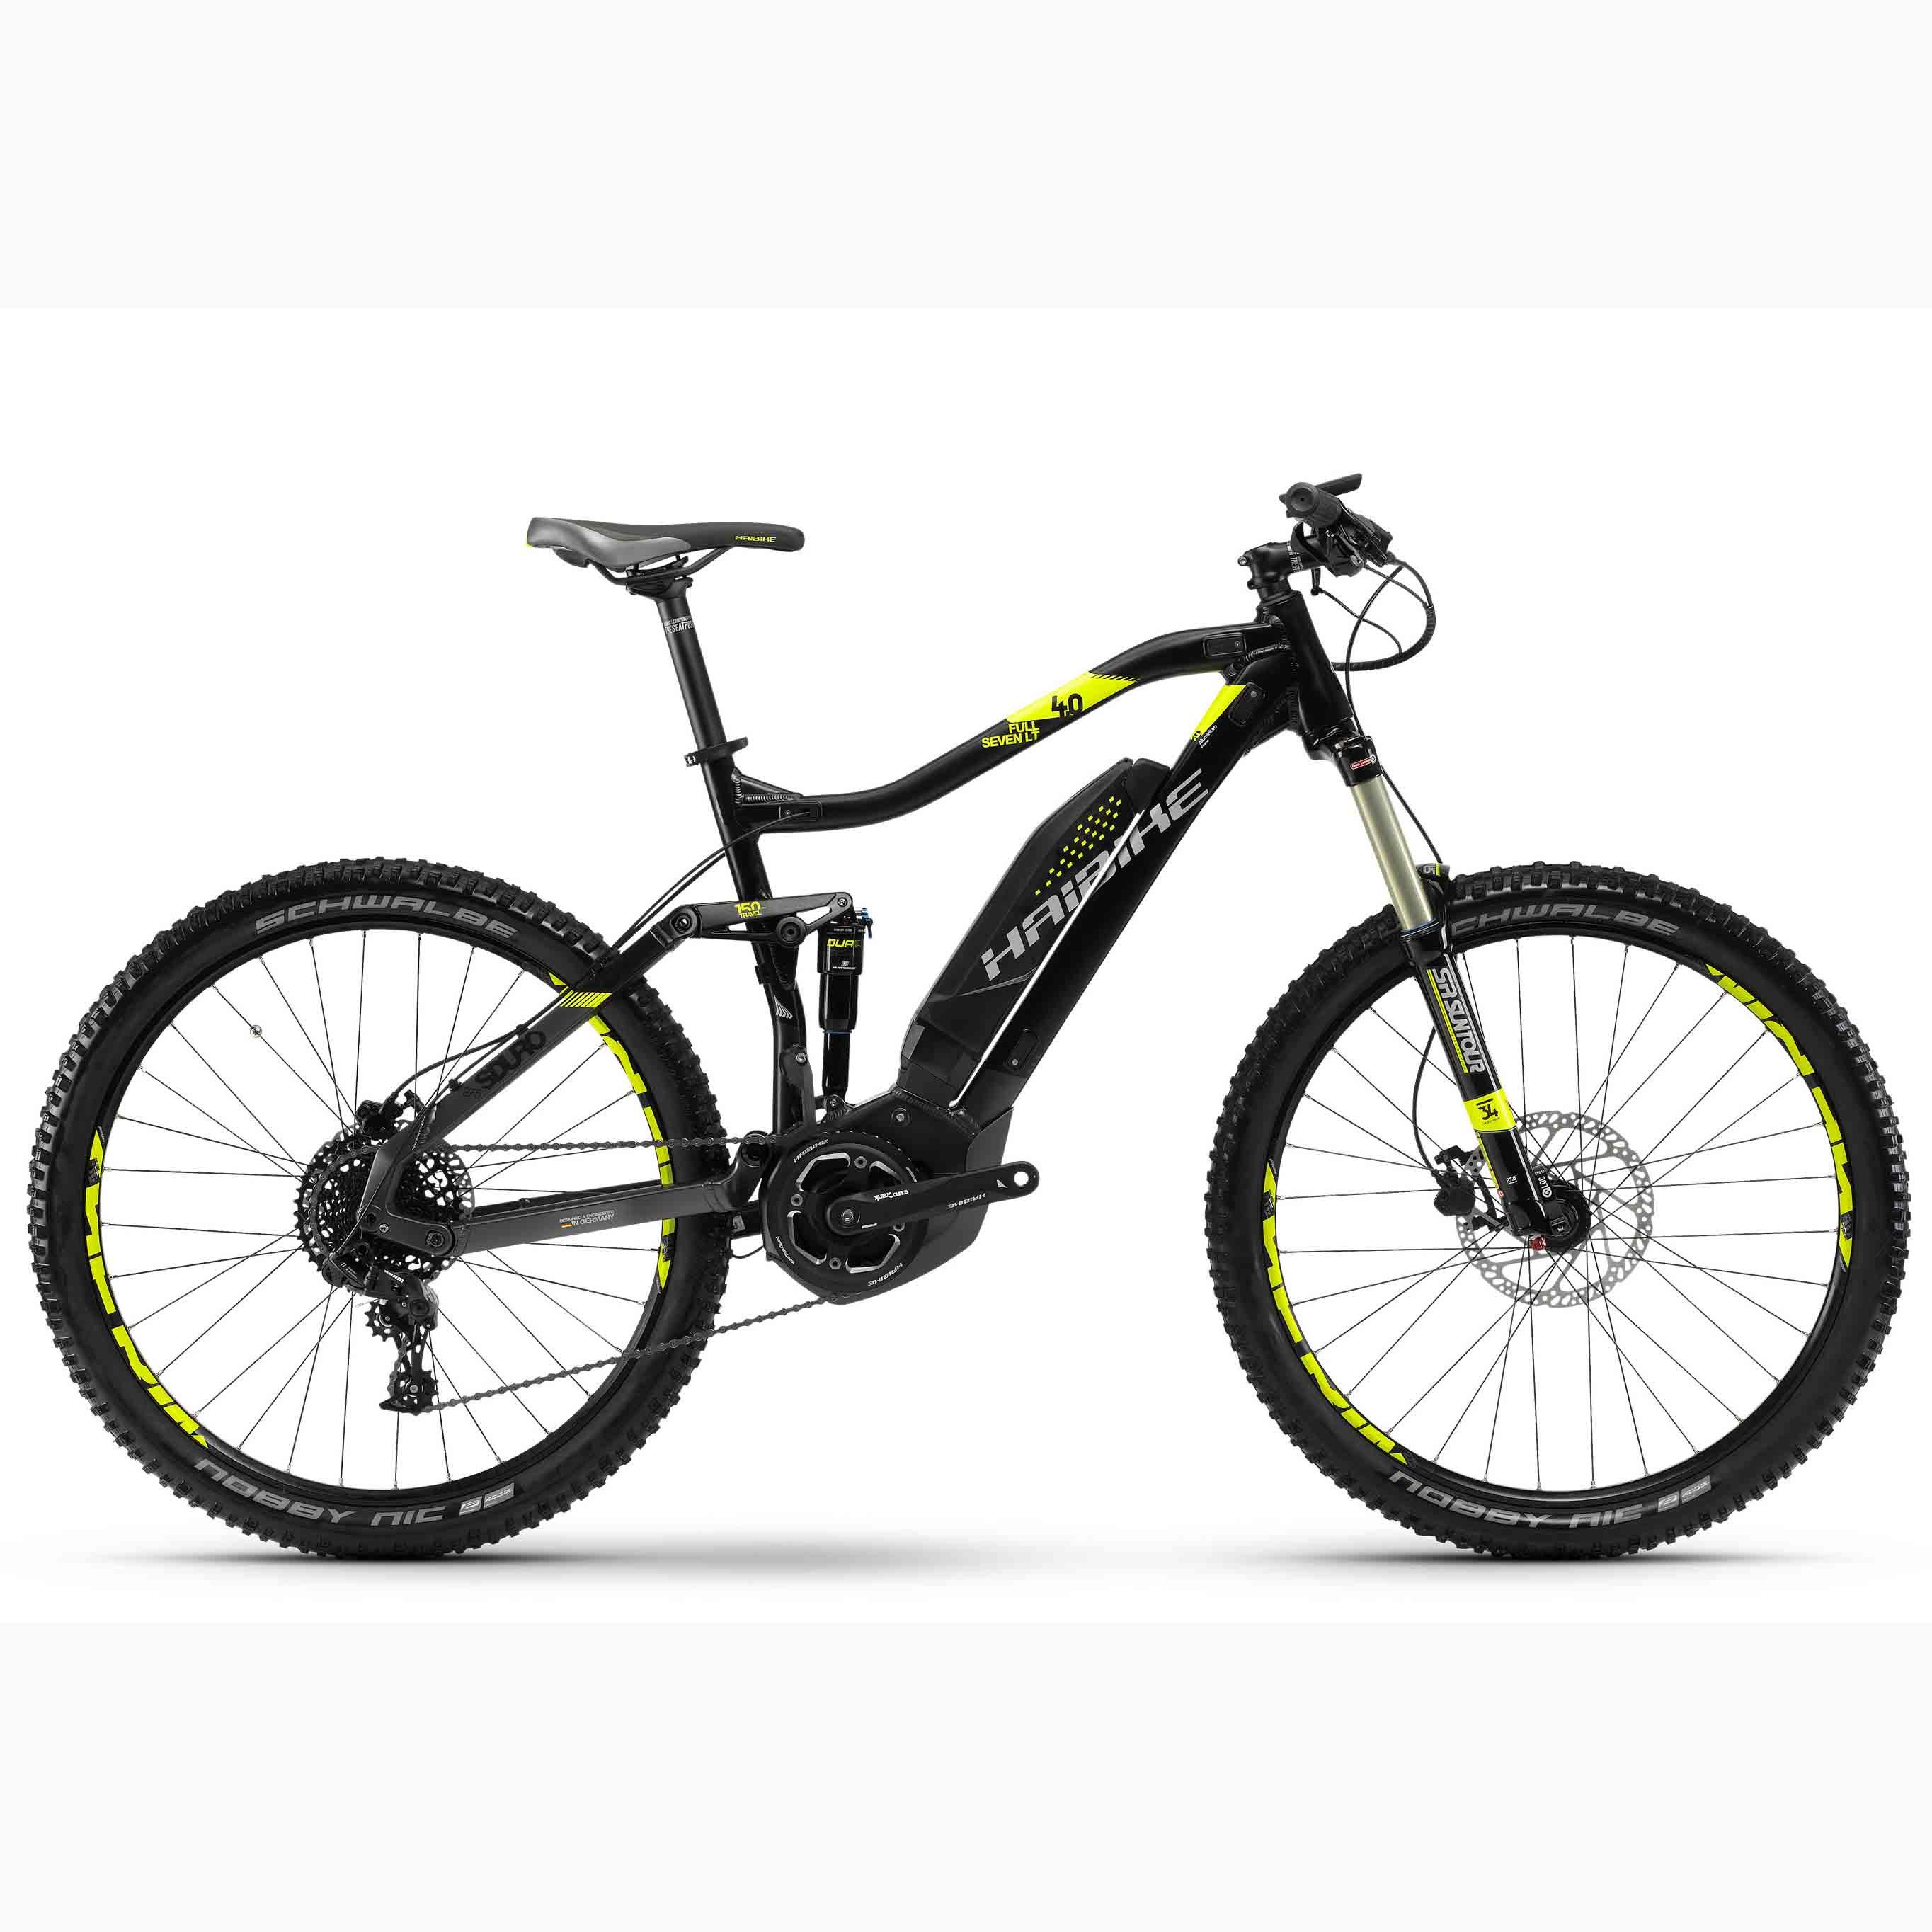 Фото Велосипед Haibike SDURO FullSeven LT 4.0 27,5″ 400Wh, рама 44см, ход:150мм, 2018